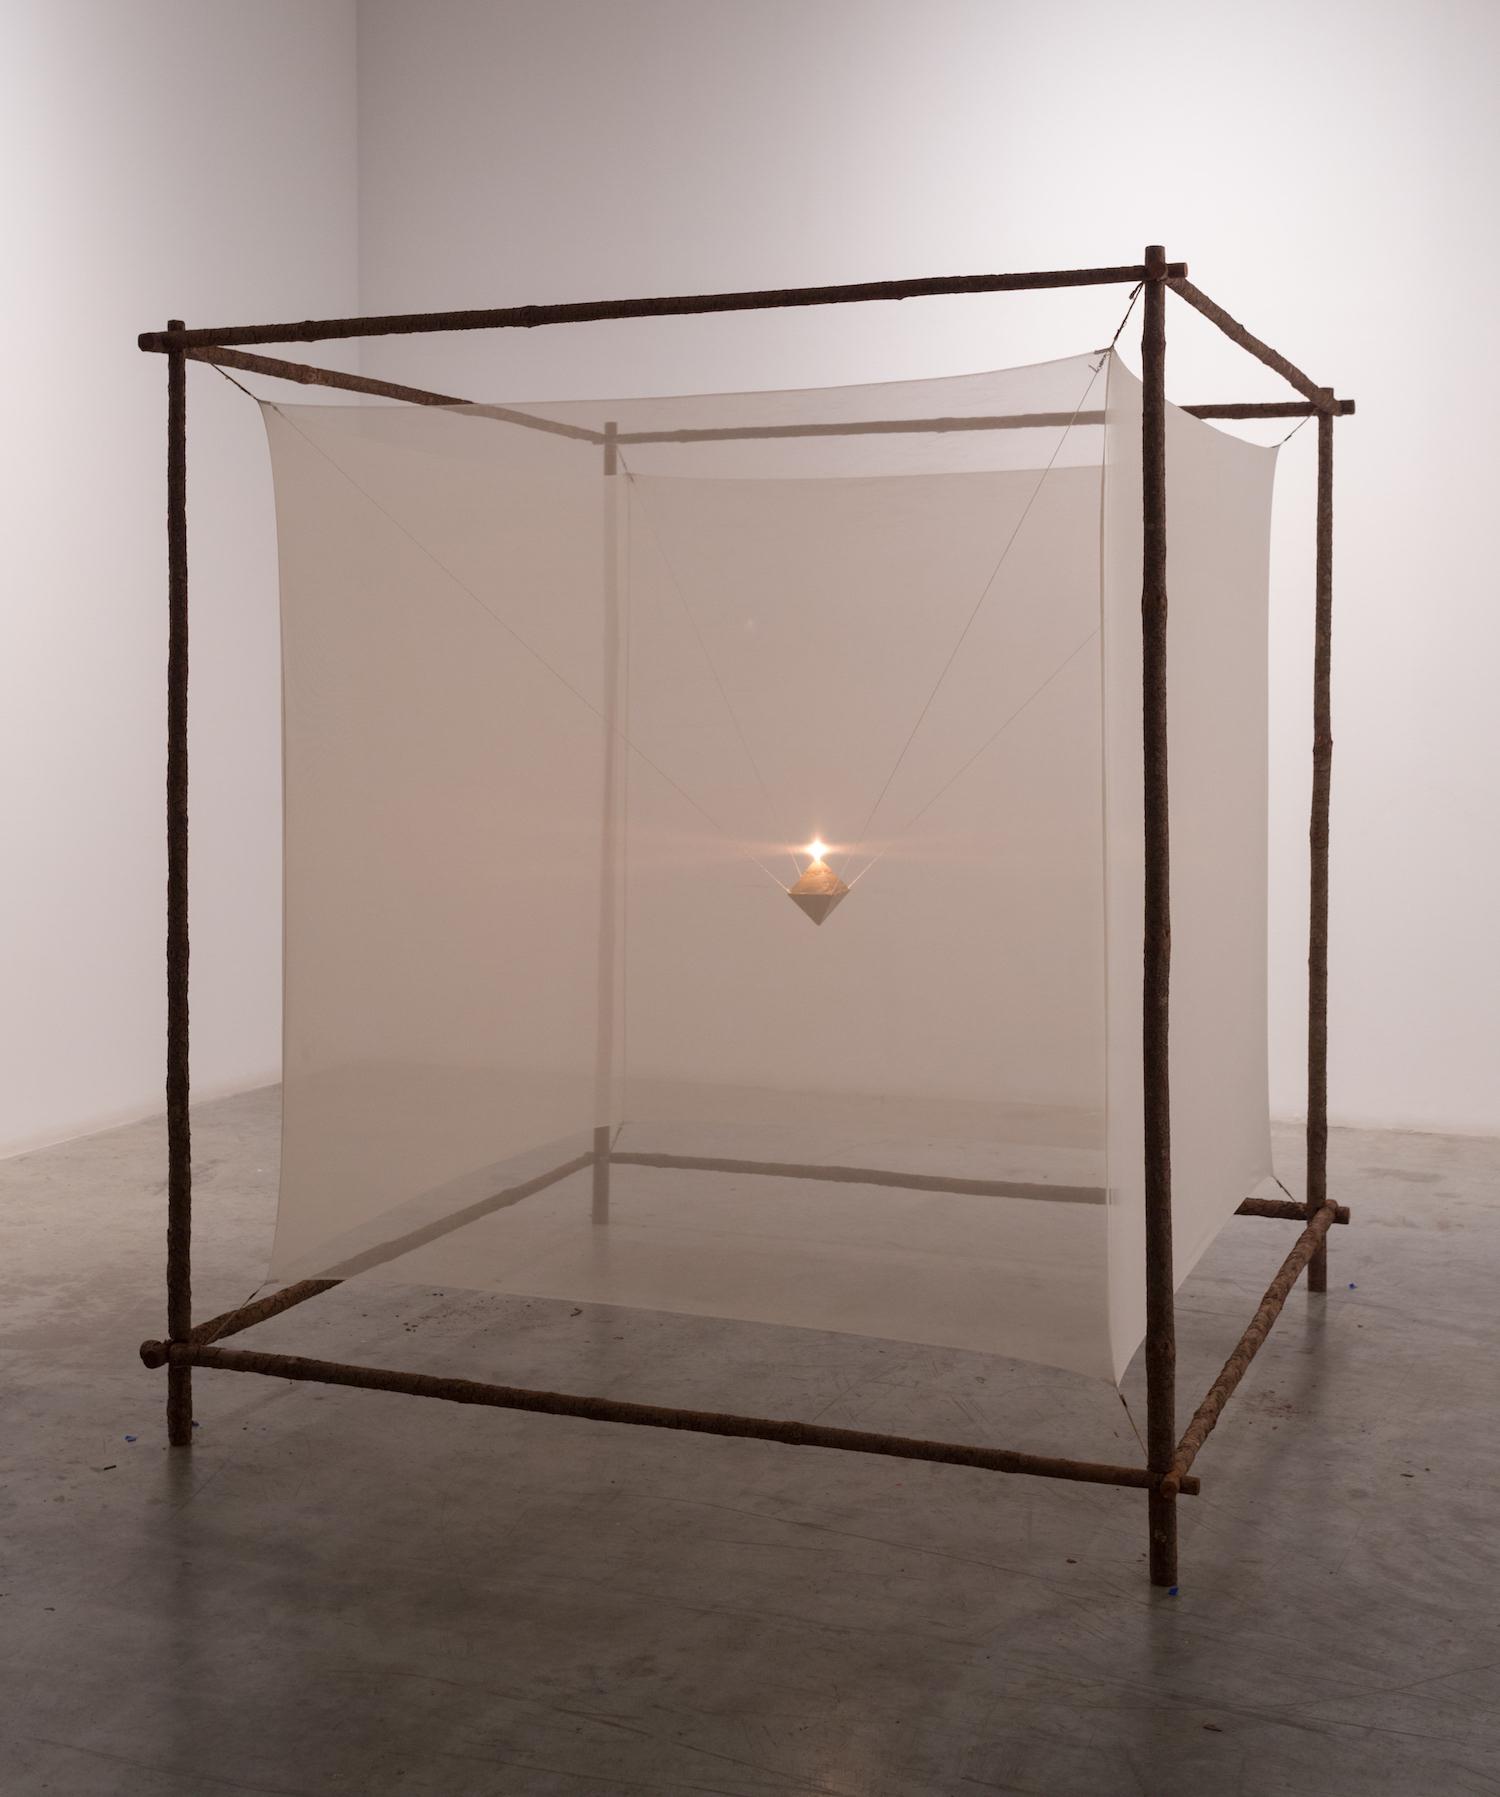 Light Within II 1982 Wood, fabric, ceramic, oil burner 182 x 182 x 182 cm